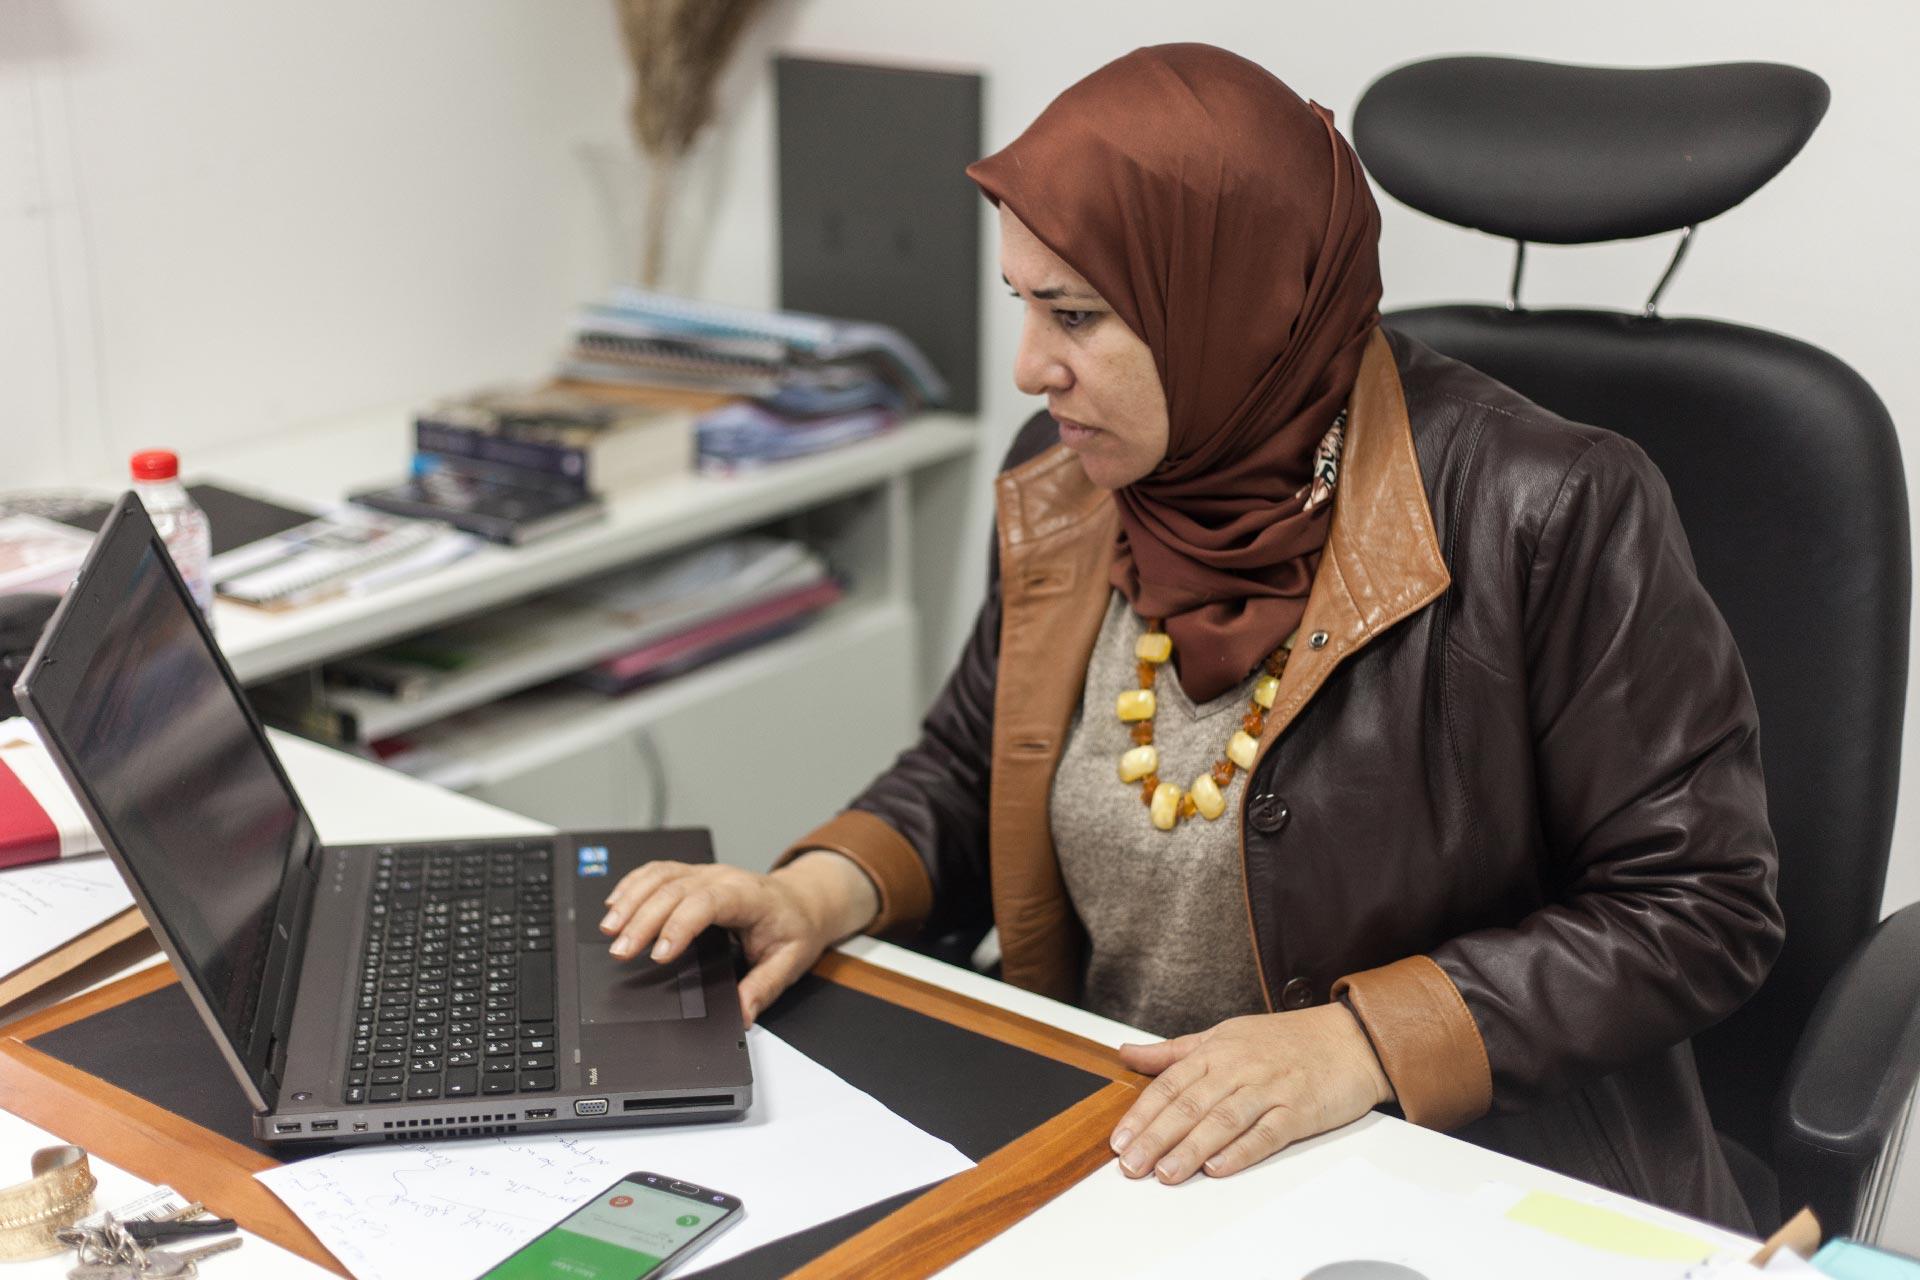 ibtihel-abdellatif-membre-ivd-presidente-commission-femmes-infyfada-tunisie